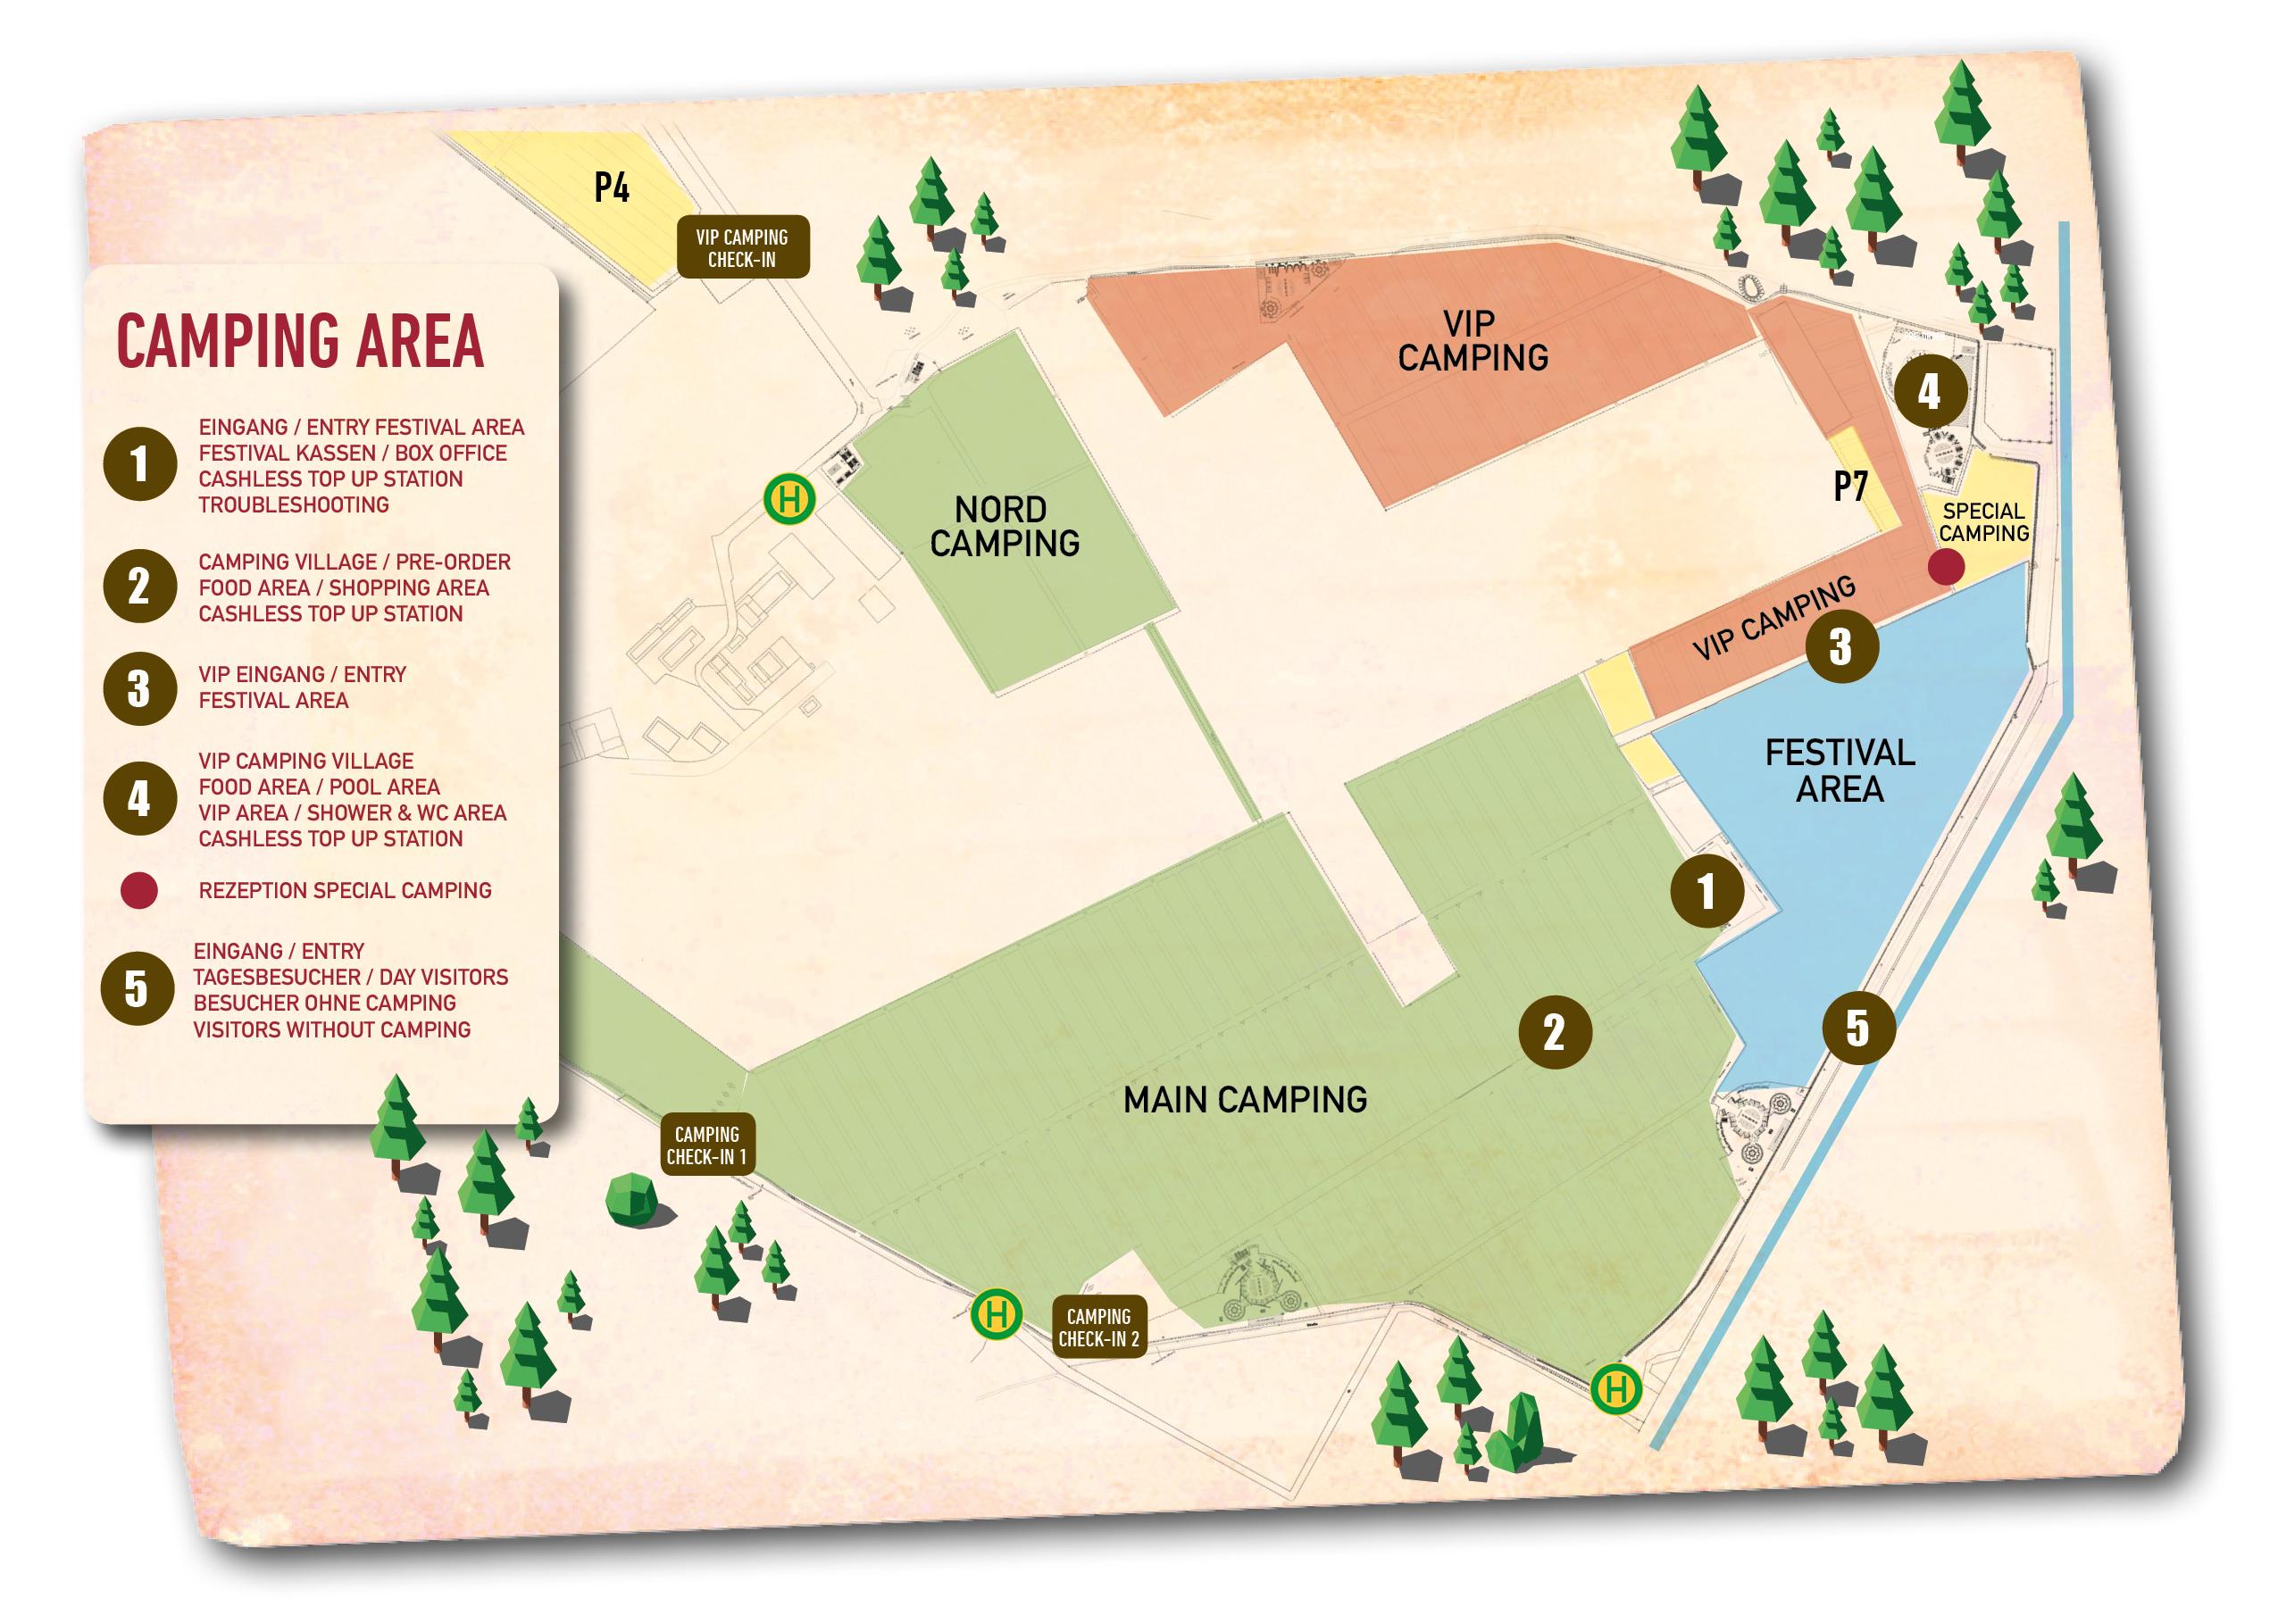 Lage & Adresse | Location & Address – ME-Events